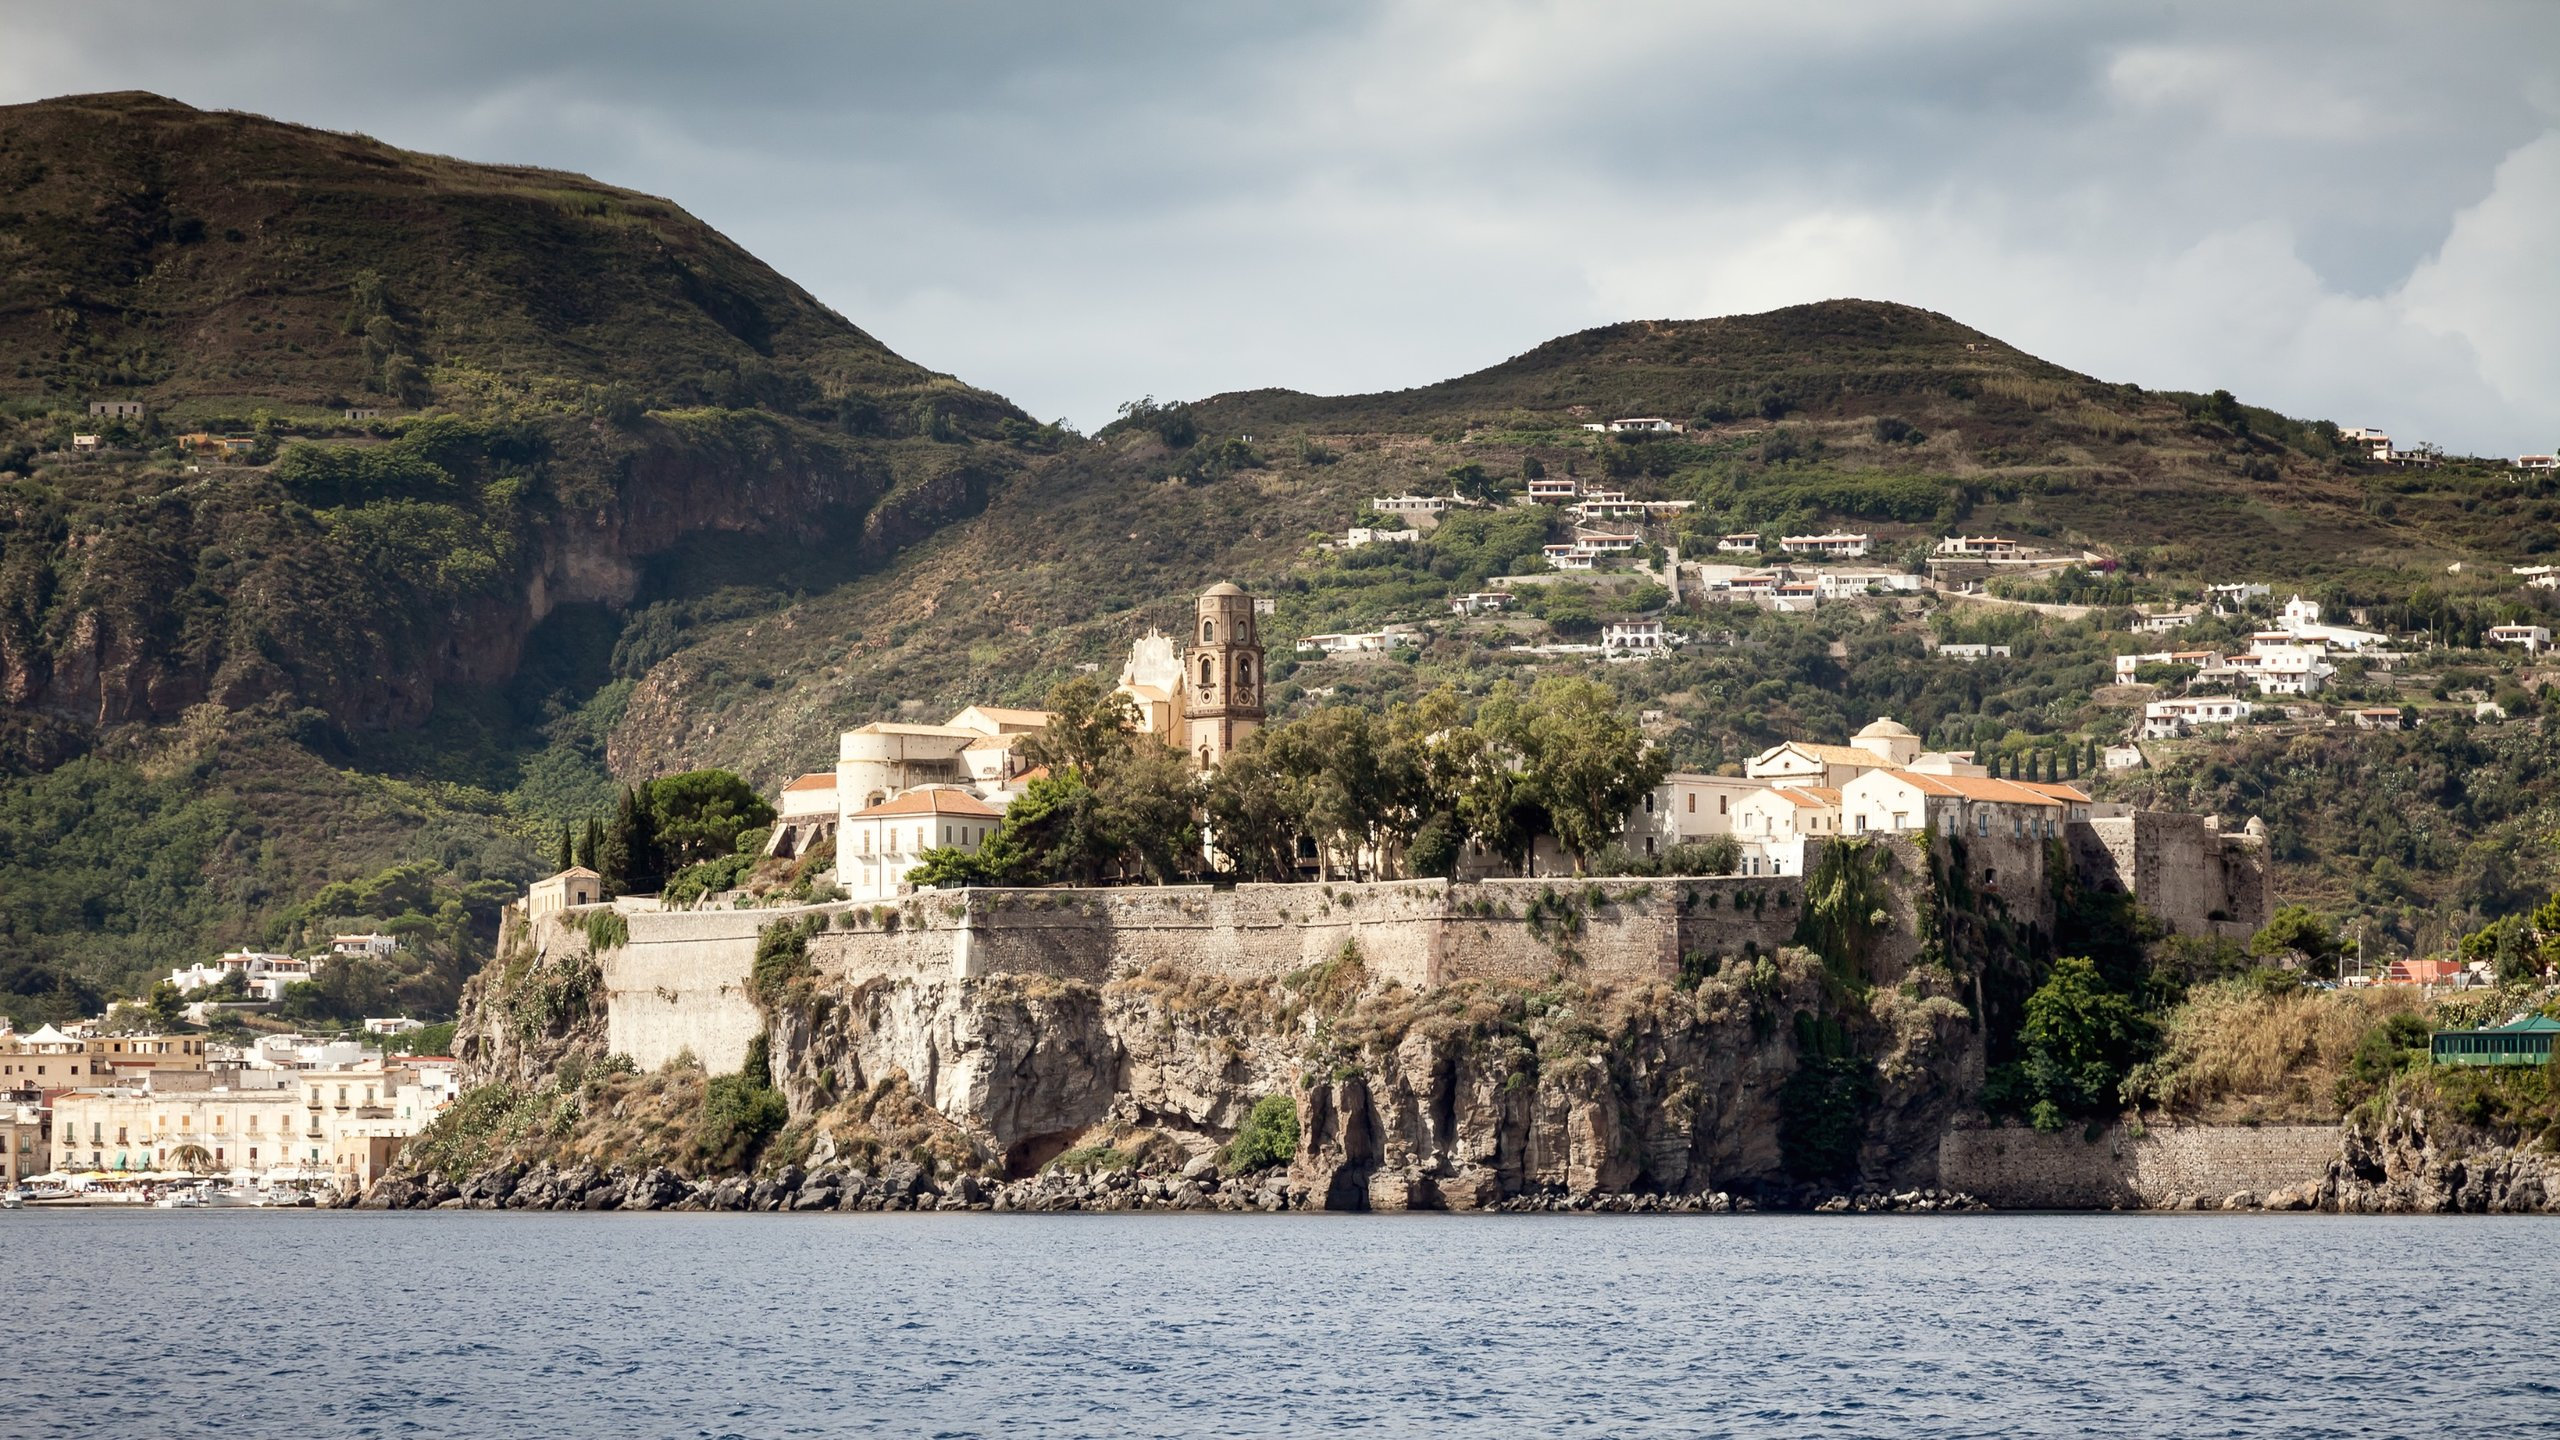 Panarea, Sicily, Italy